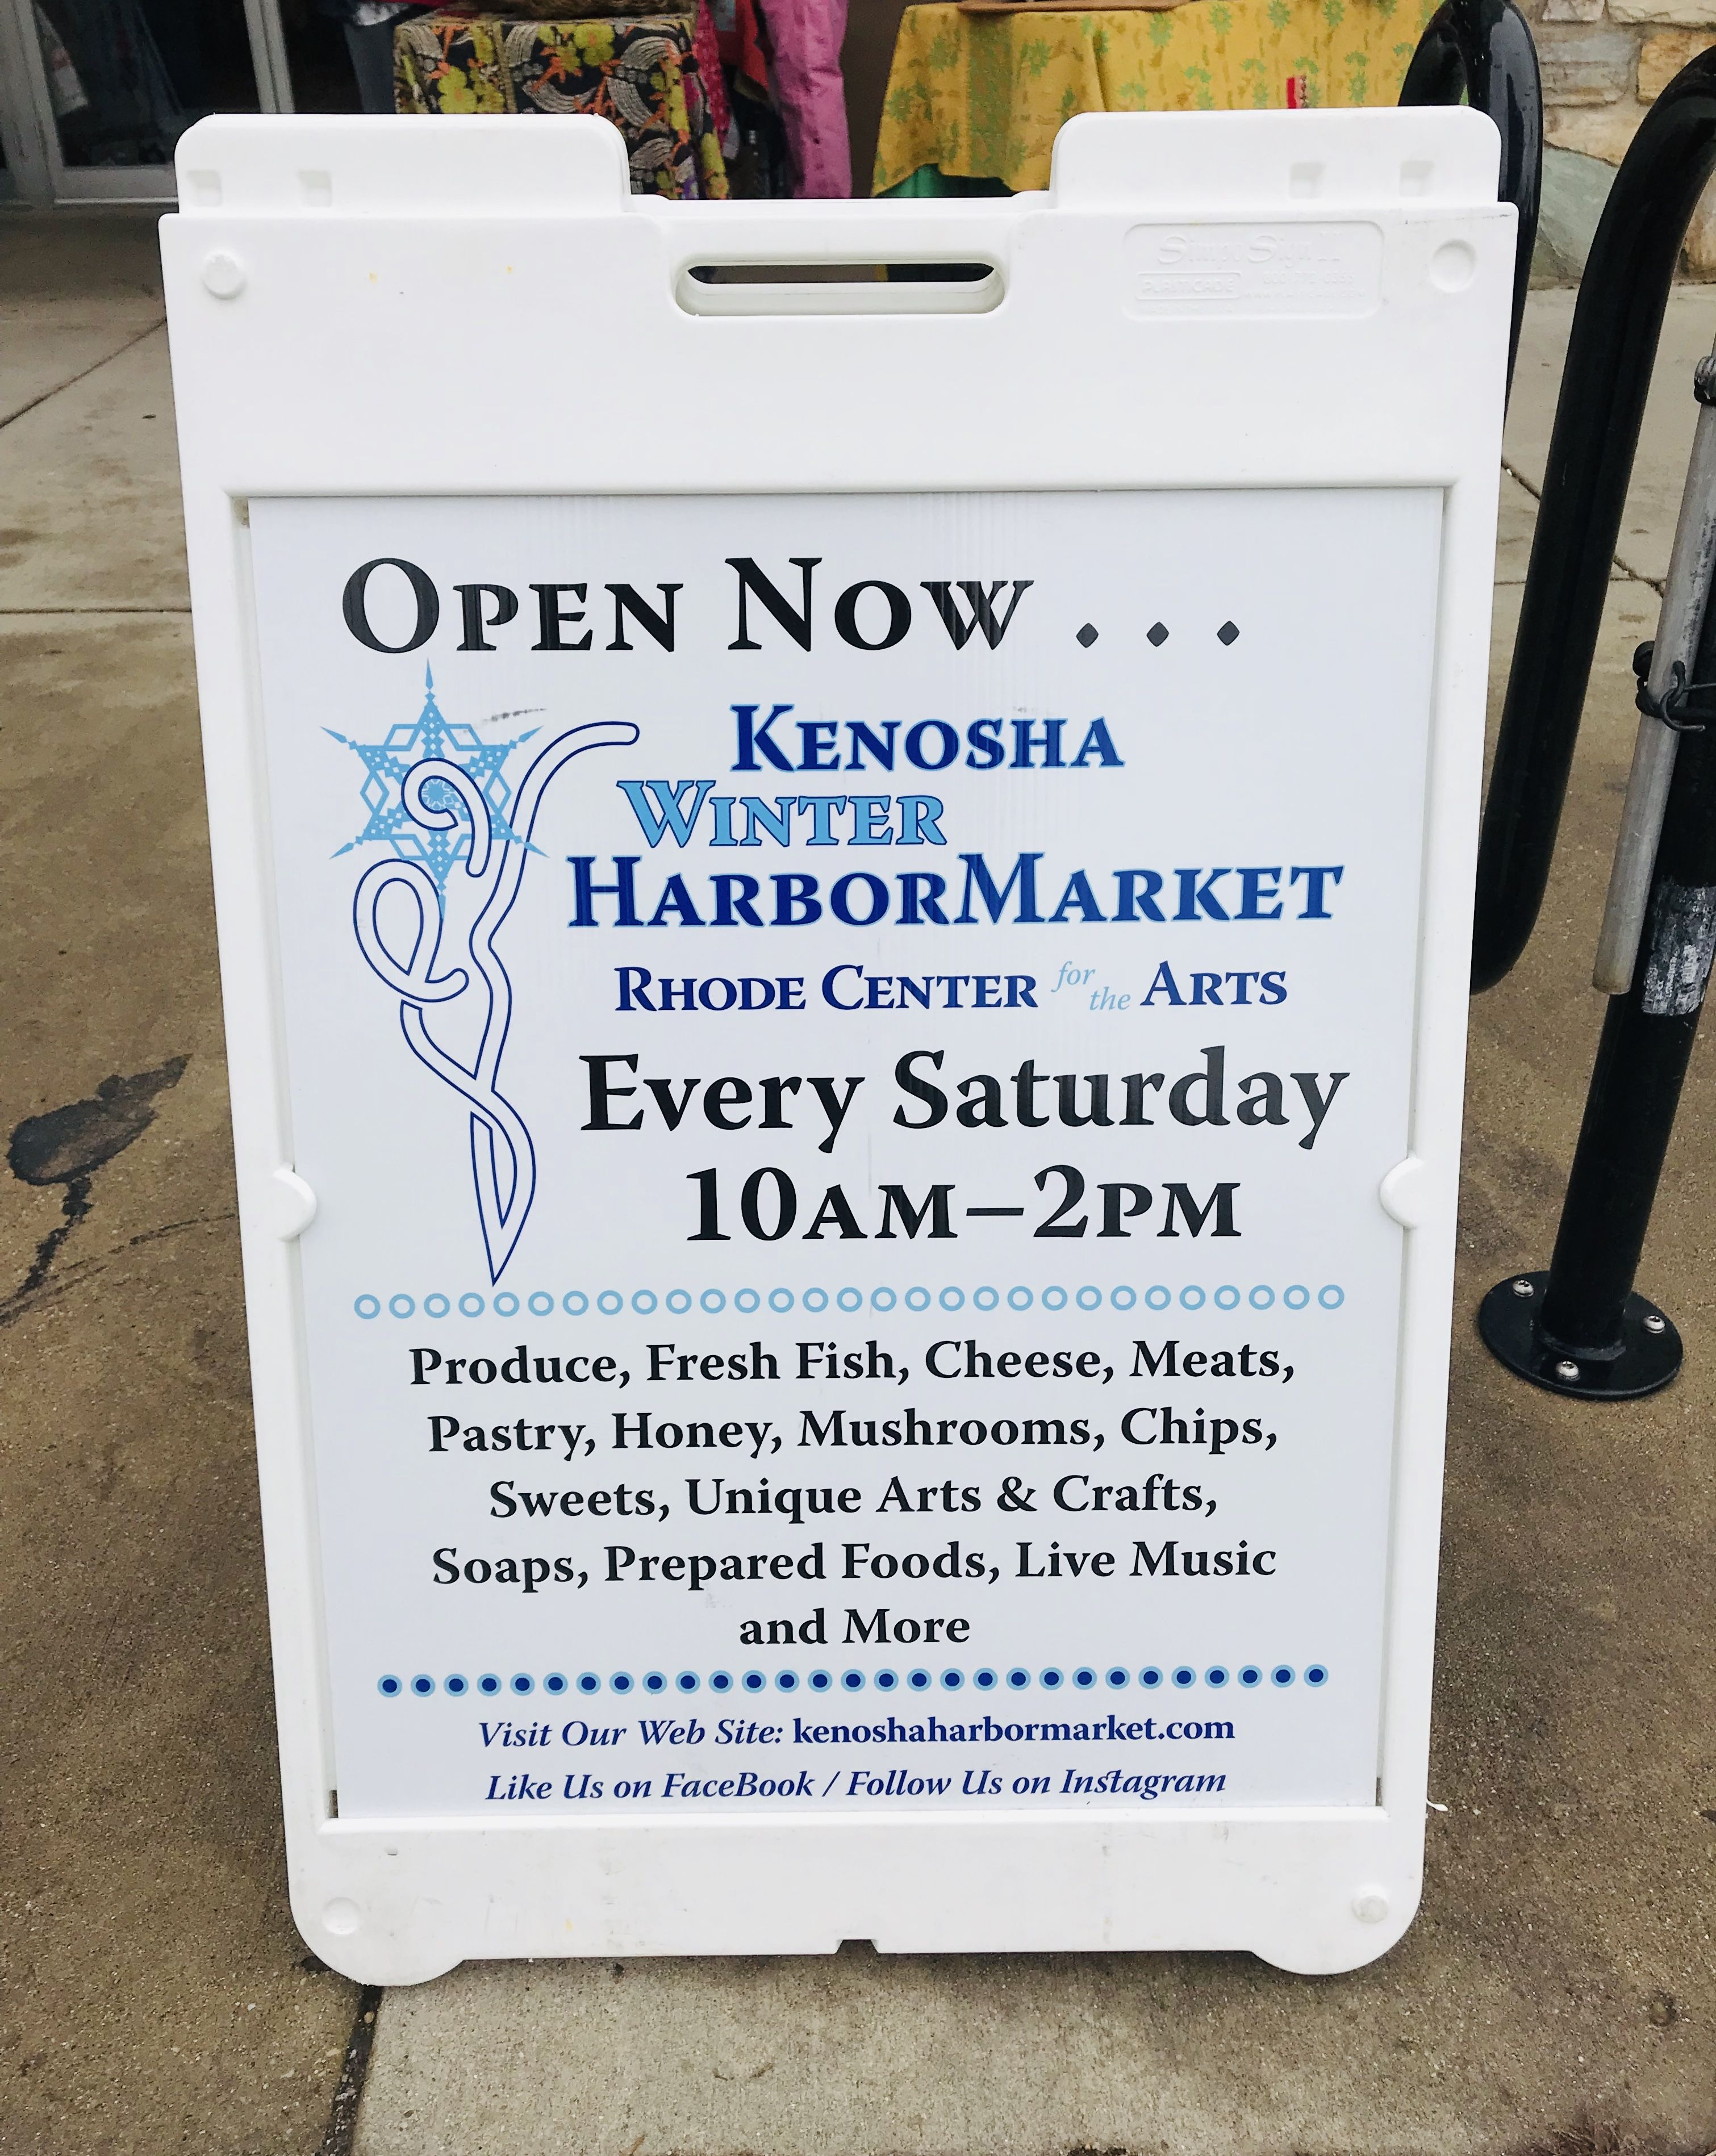 2019 Small Business Saturday Advertising Ideas Saturdays Only: Kenosha Winter HarborMarket, Kenosha, WI